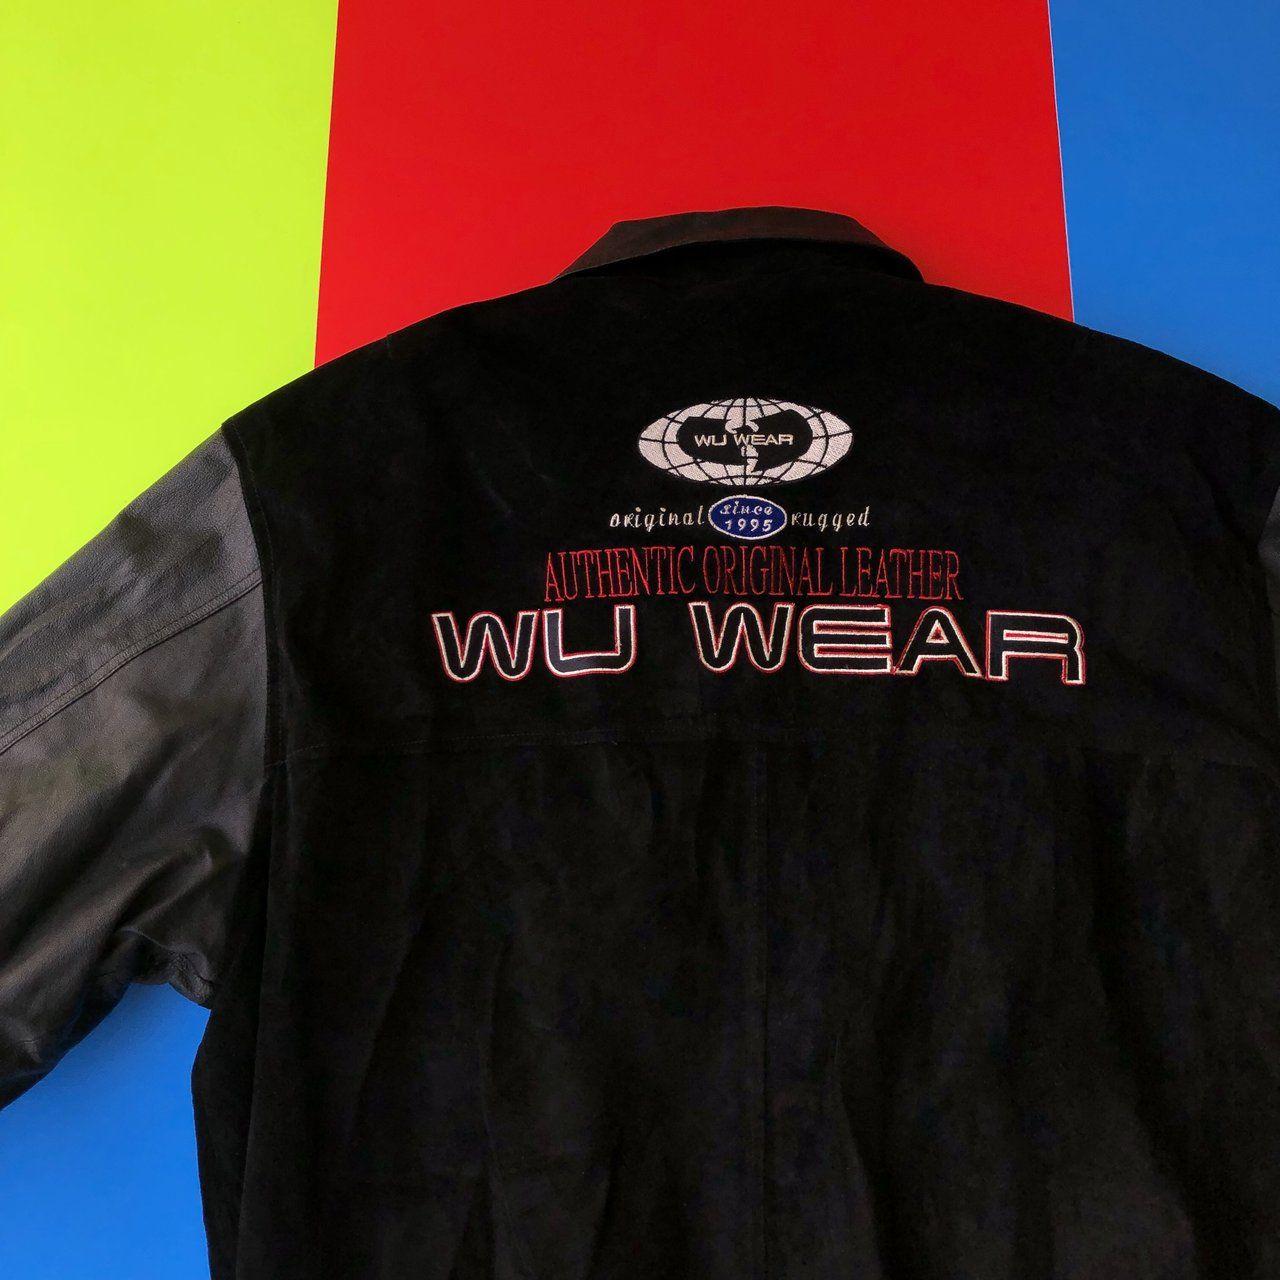 Rare 90s Vintage Wutang Clan Wu Wear Leather Jacket Men S Xl Women S Xxl Authentic Original Leather Sleeves Coll How To Wear Leather Jacket Vintage Outfits [ 1280 x 1280 Pixel ]